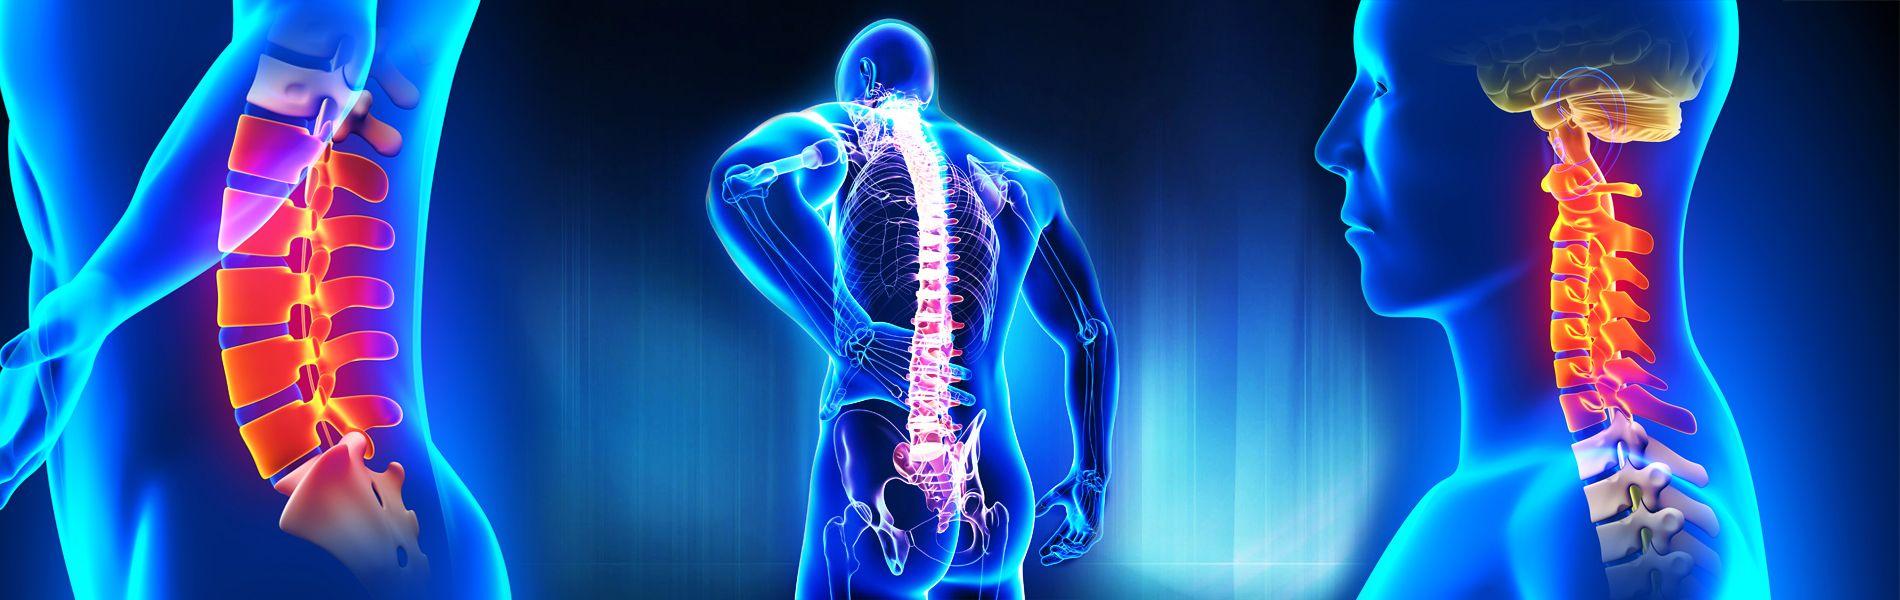 22++ Colorado center for arthritis and osteoporosis longmont co info